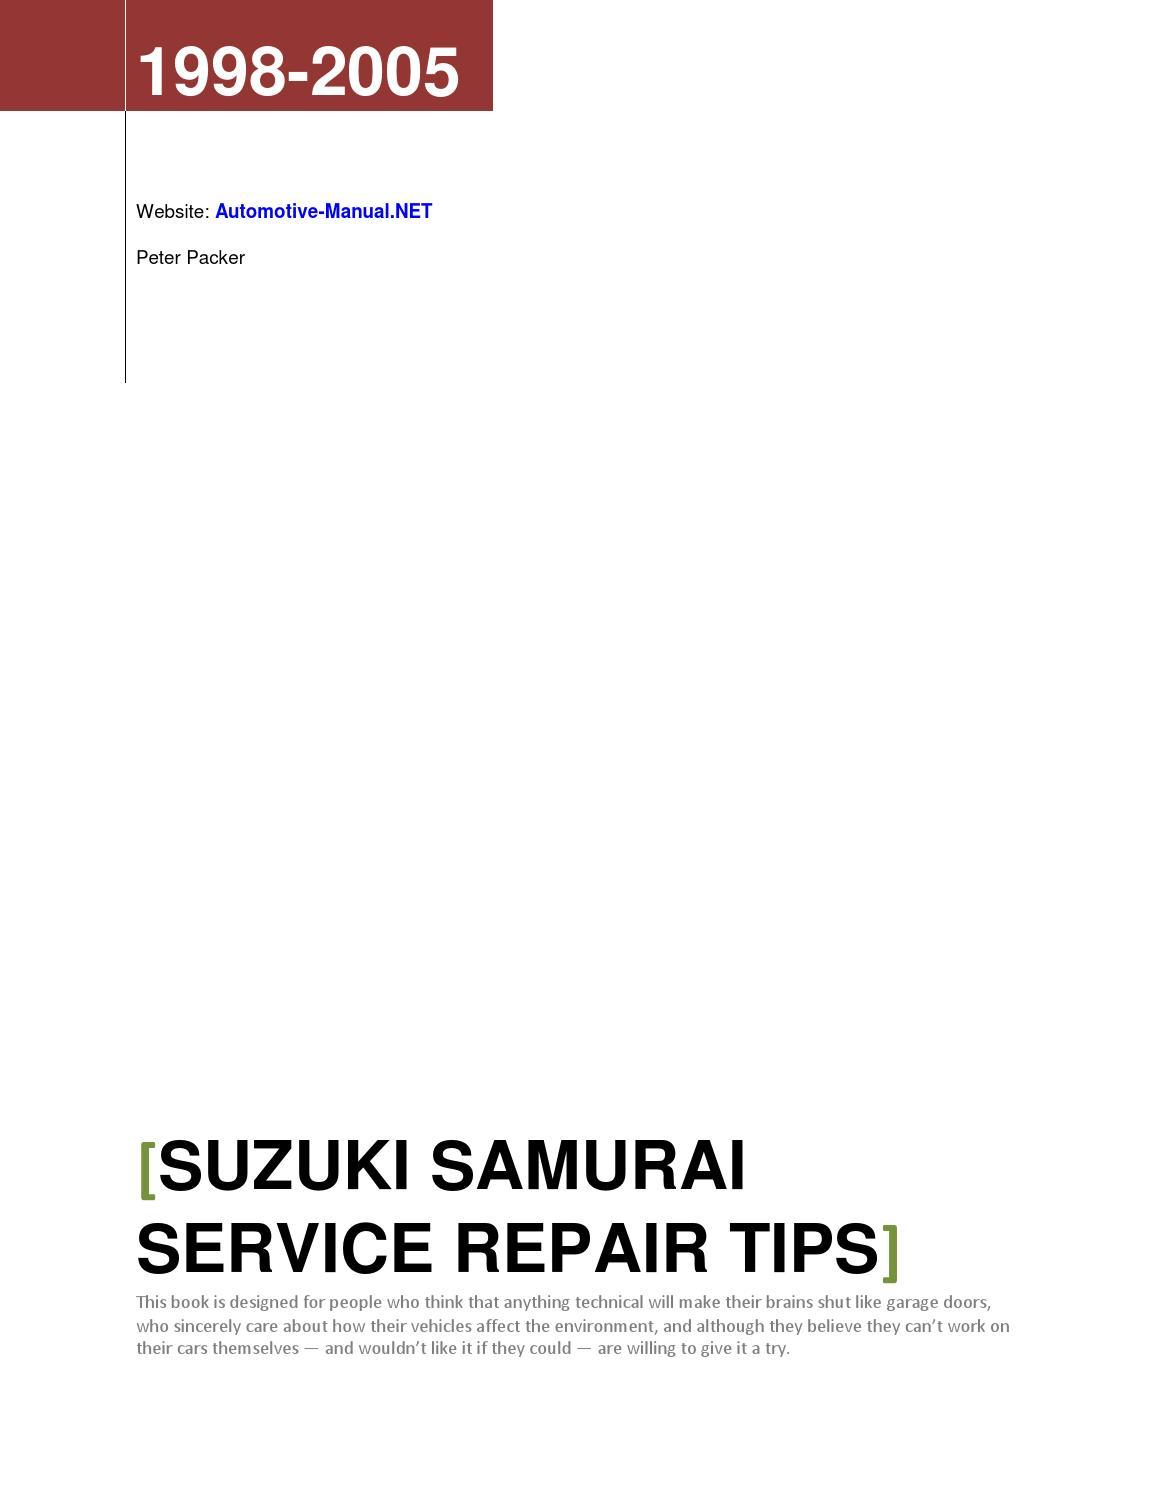 Suzuki Samurai 1998-2005 Service Repair Tips by Armando